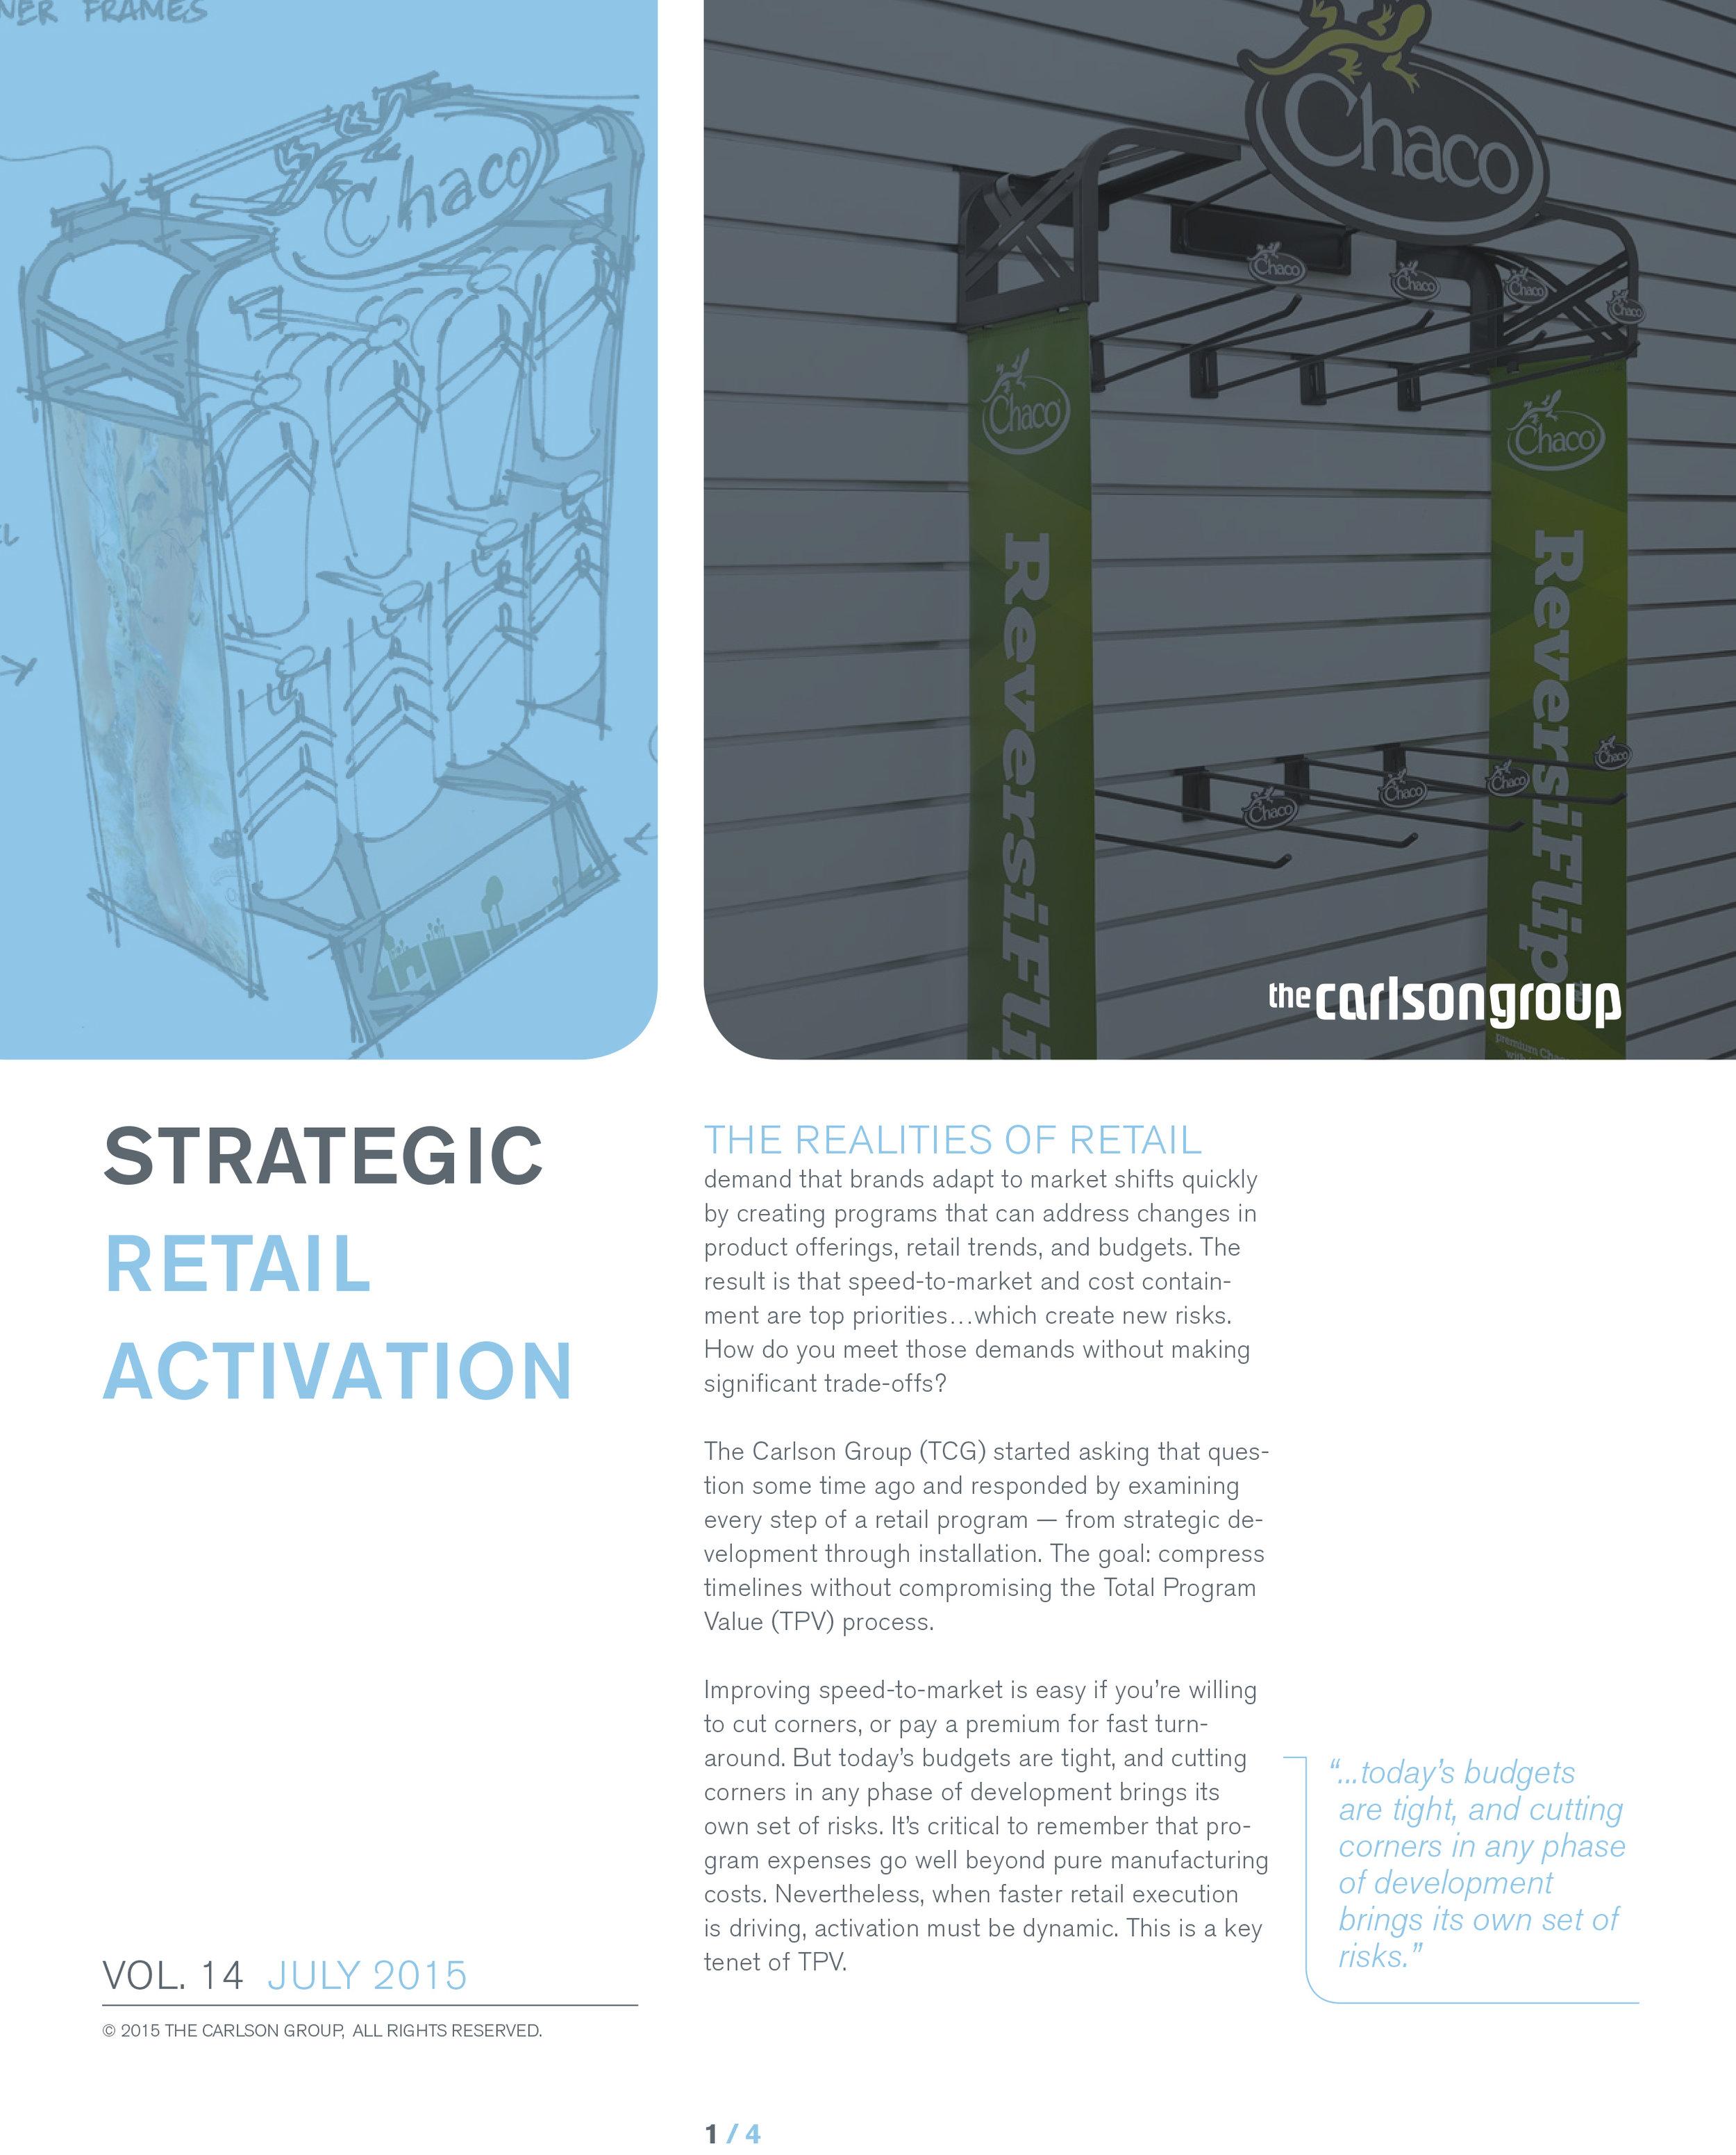 STRATEGIC RETAIL ACTIVATION